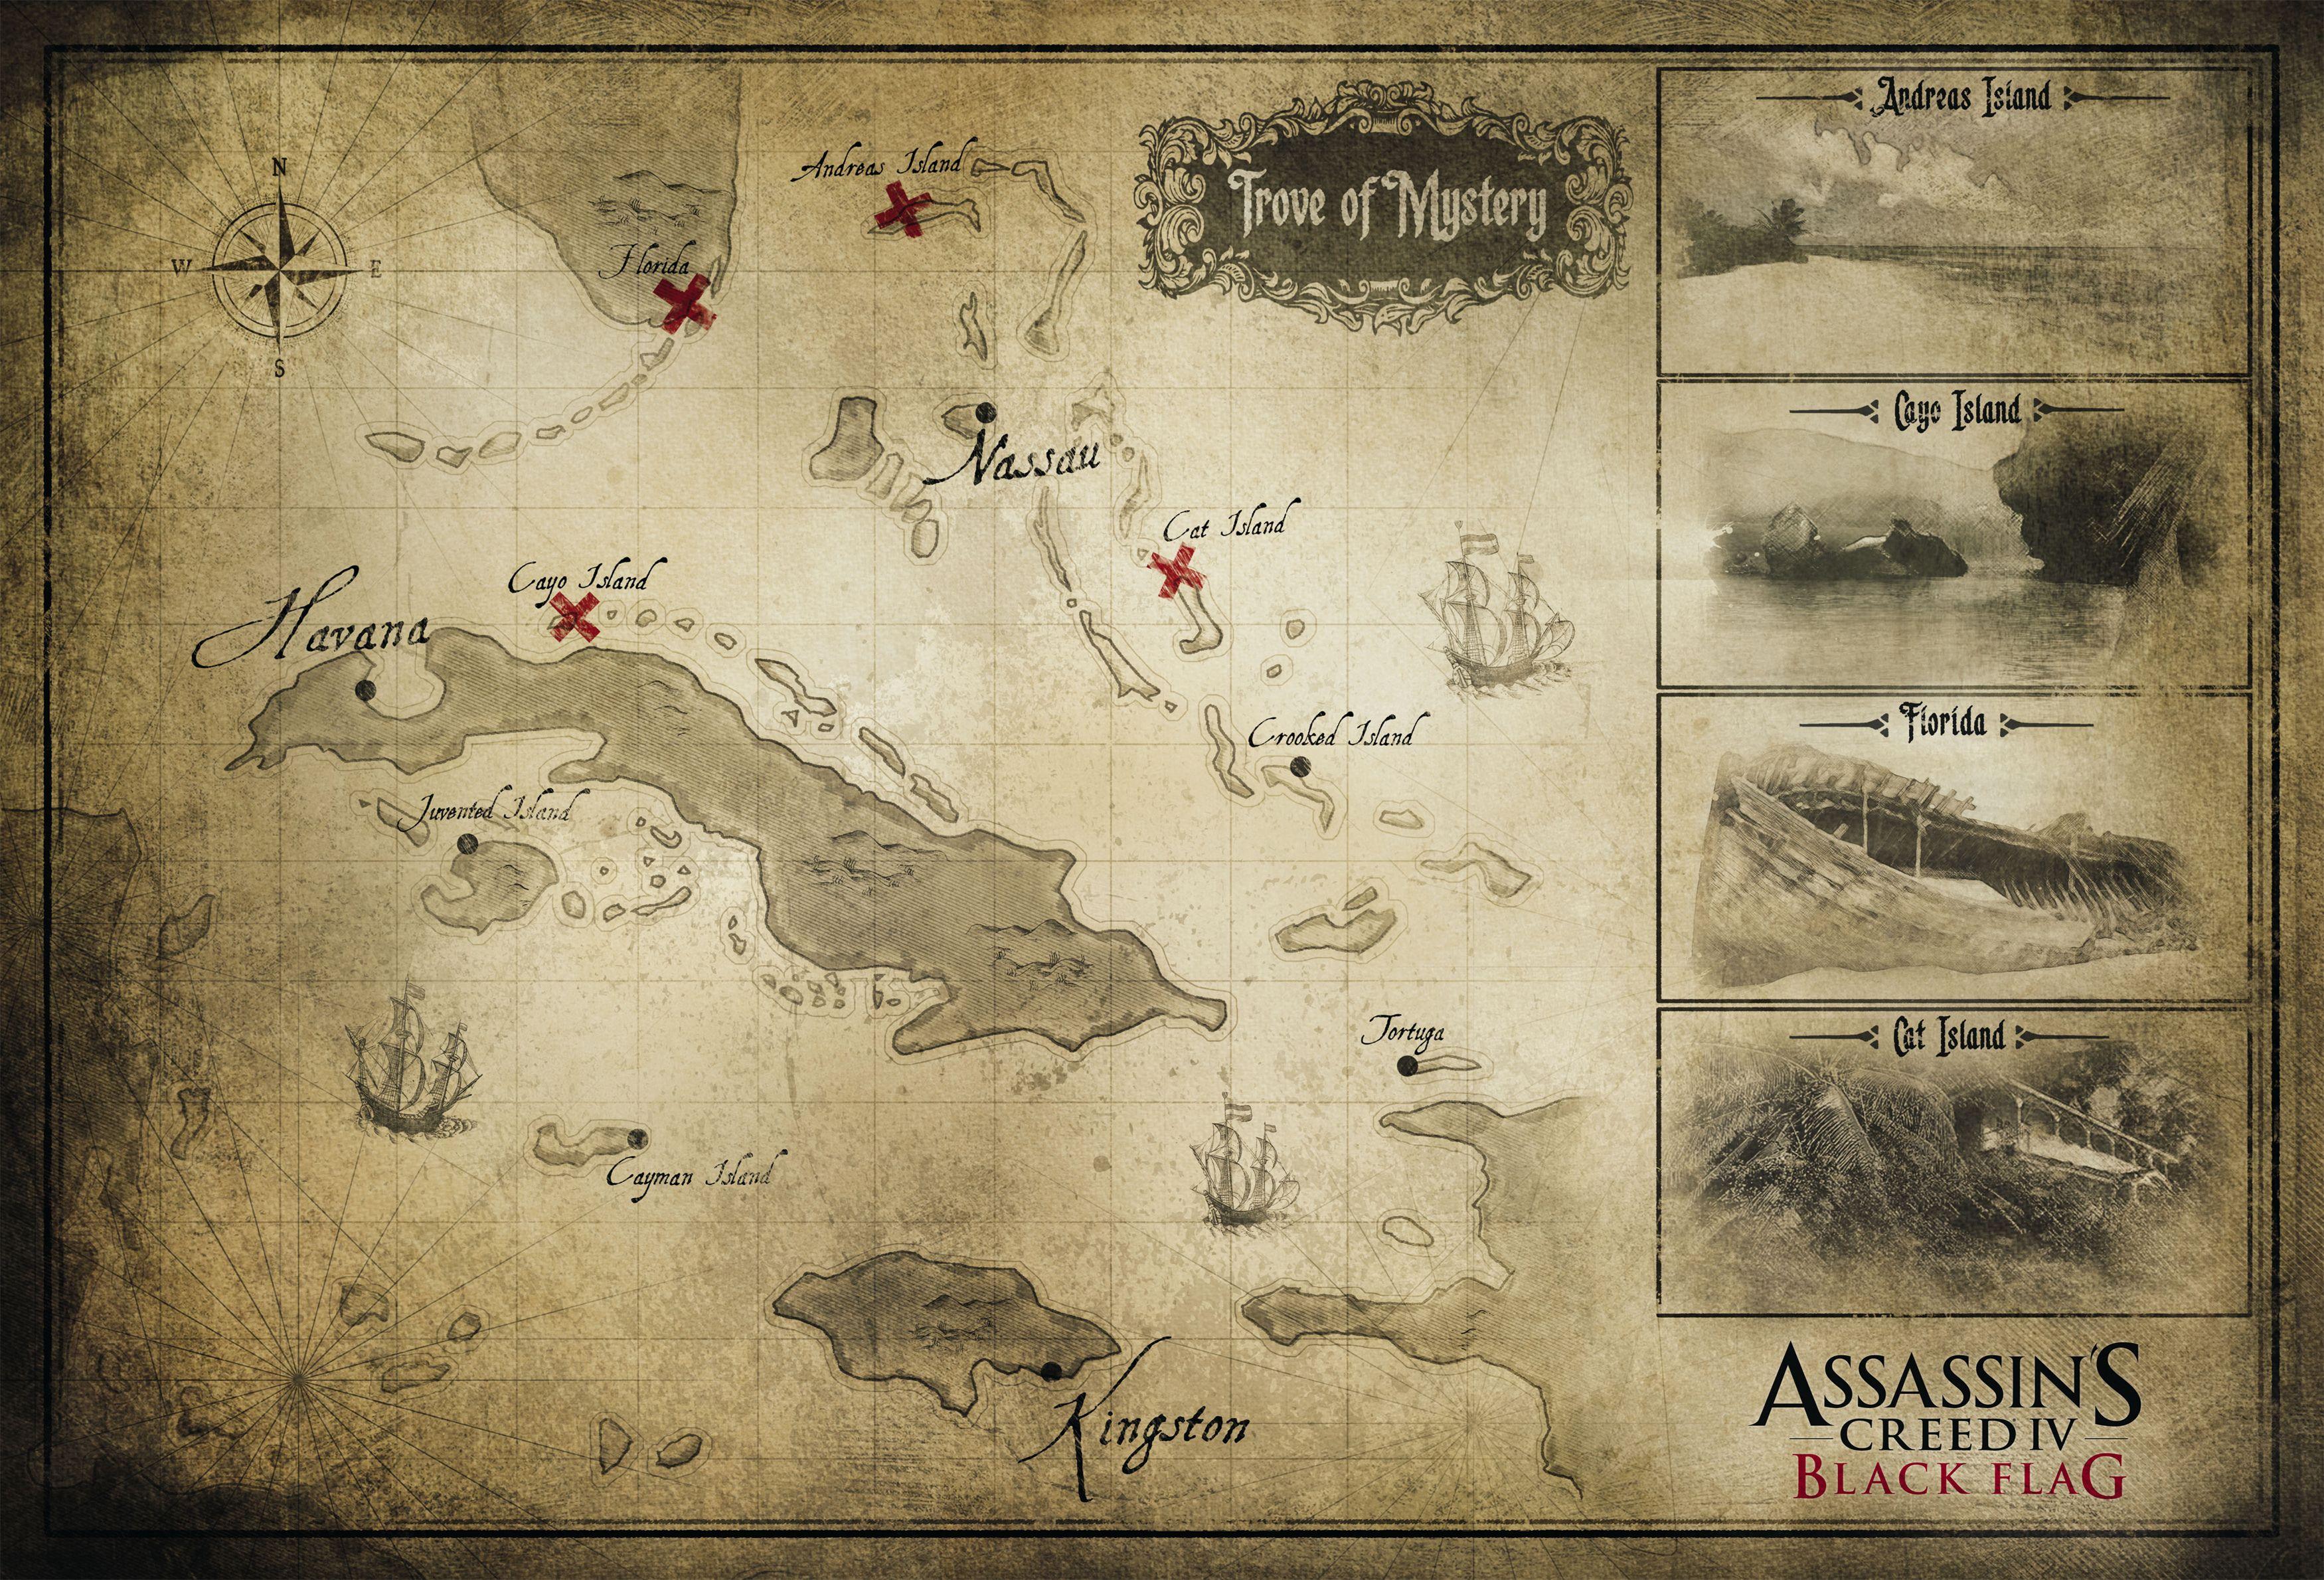 Assasins Creed Assassins Creed Black Flag Assassins Creed 4